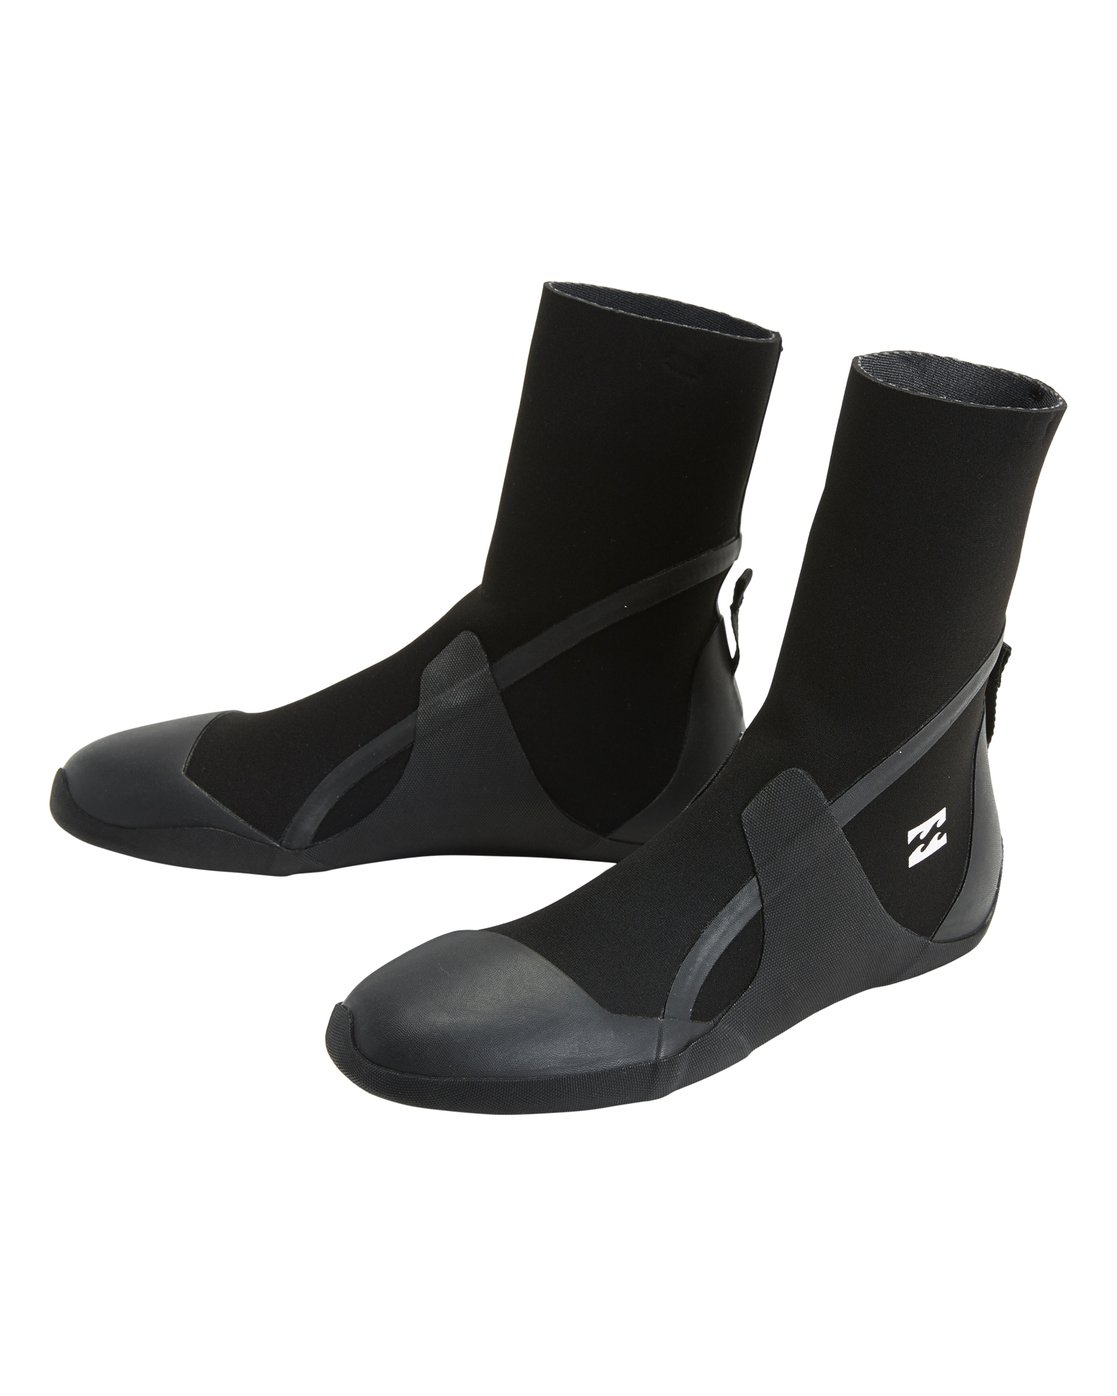 neoprénové boty 3mm '21 Billabong Absolute - 12